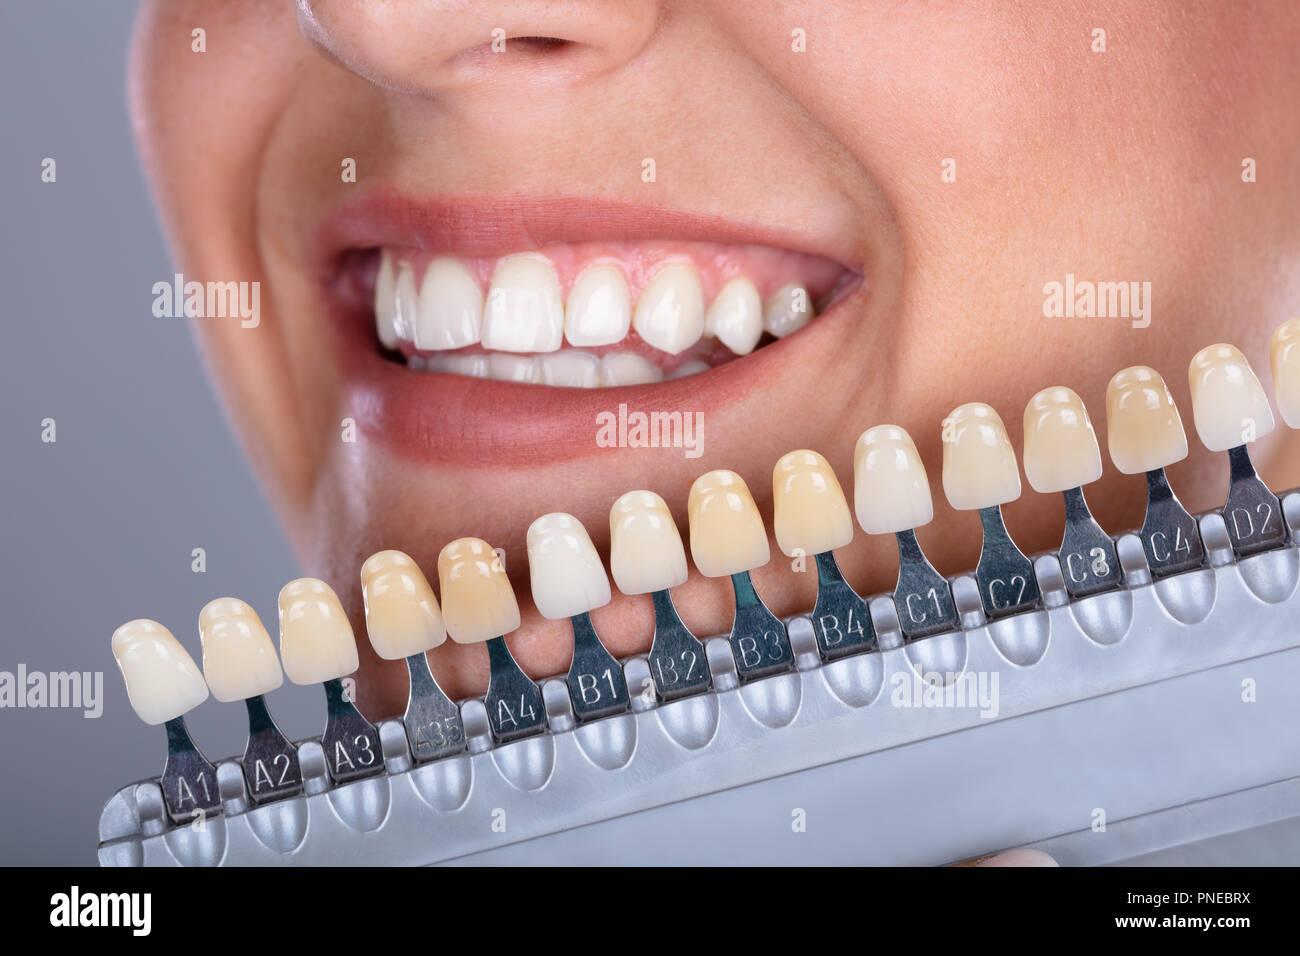 B1 zahnfarbe Zahnfarben